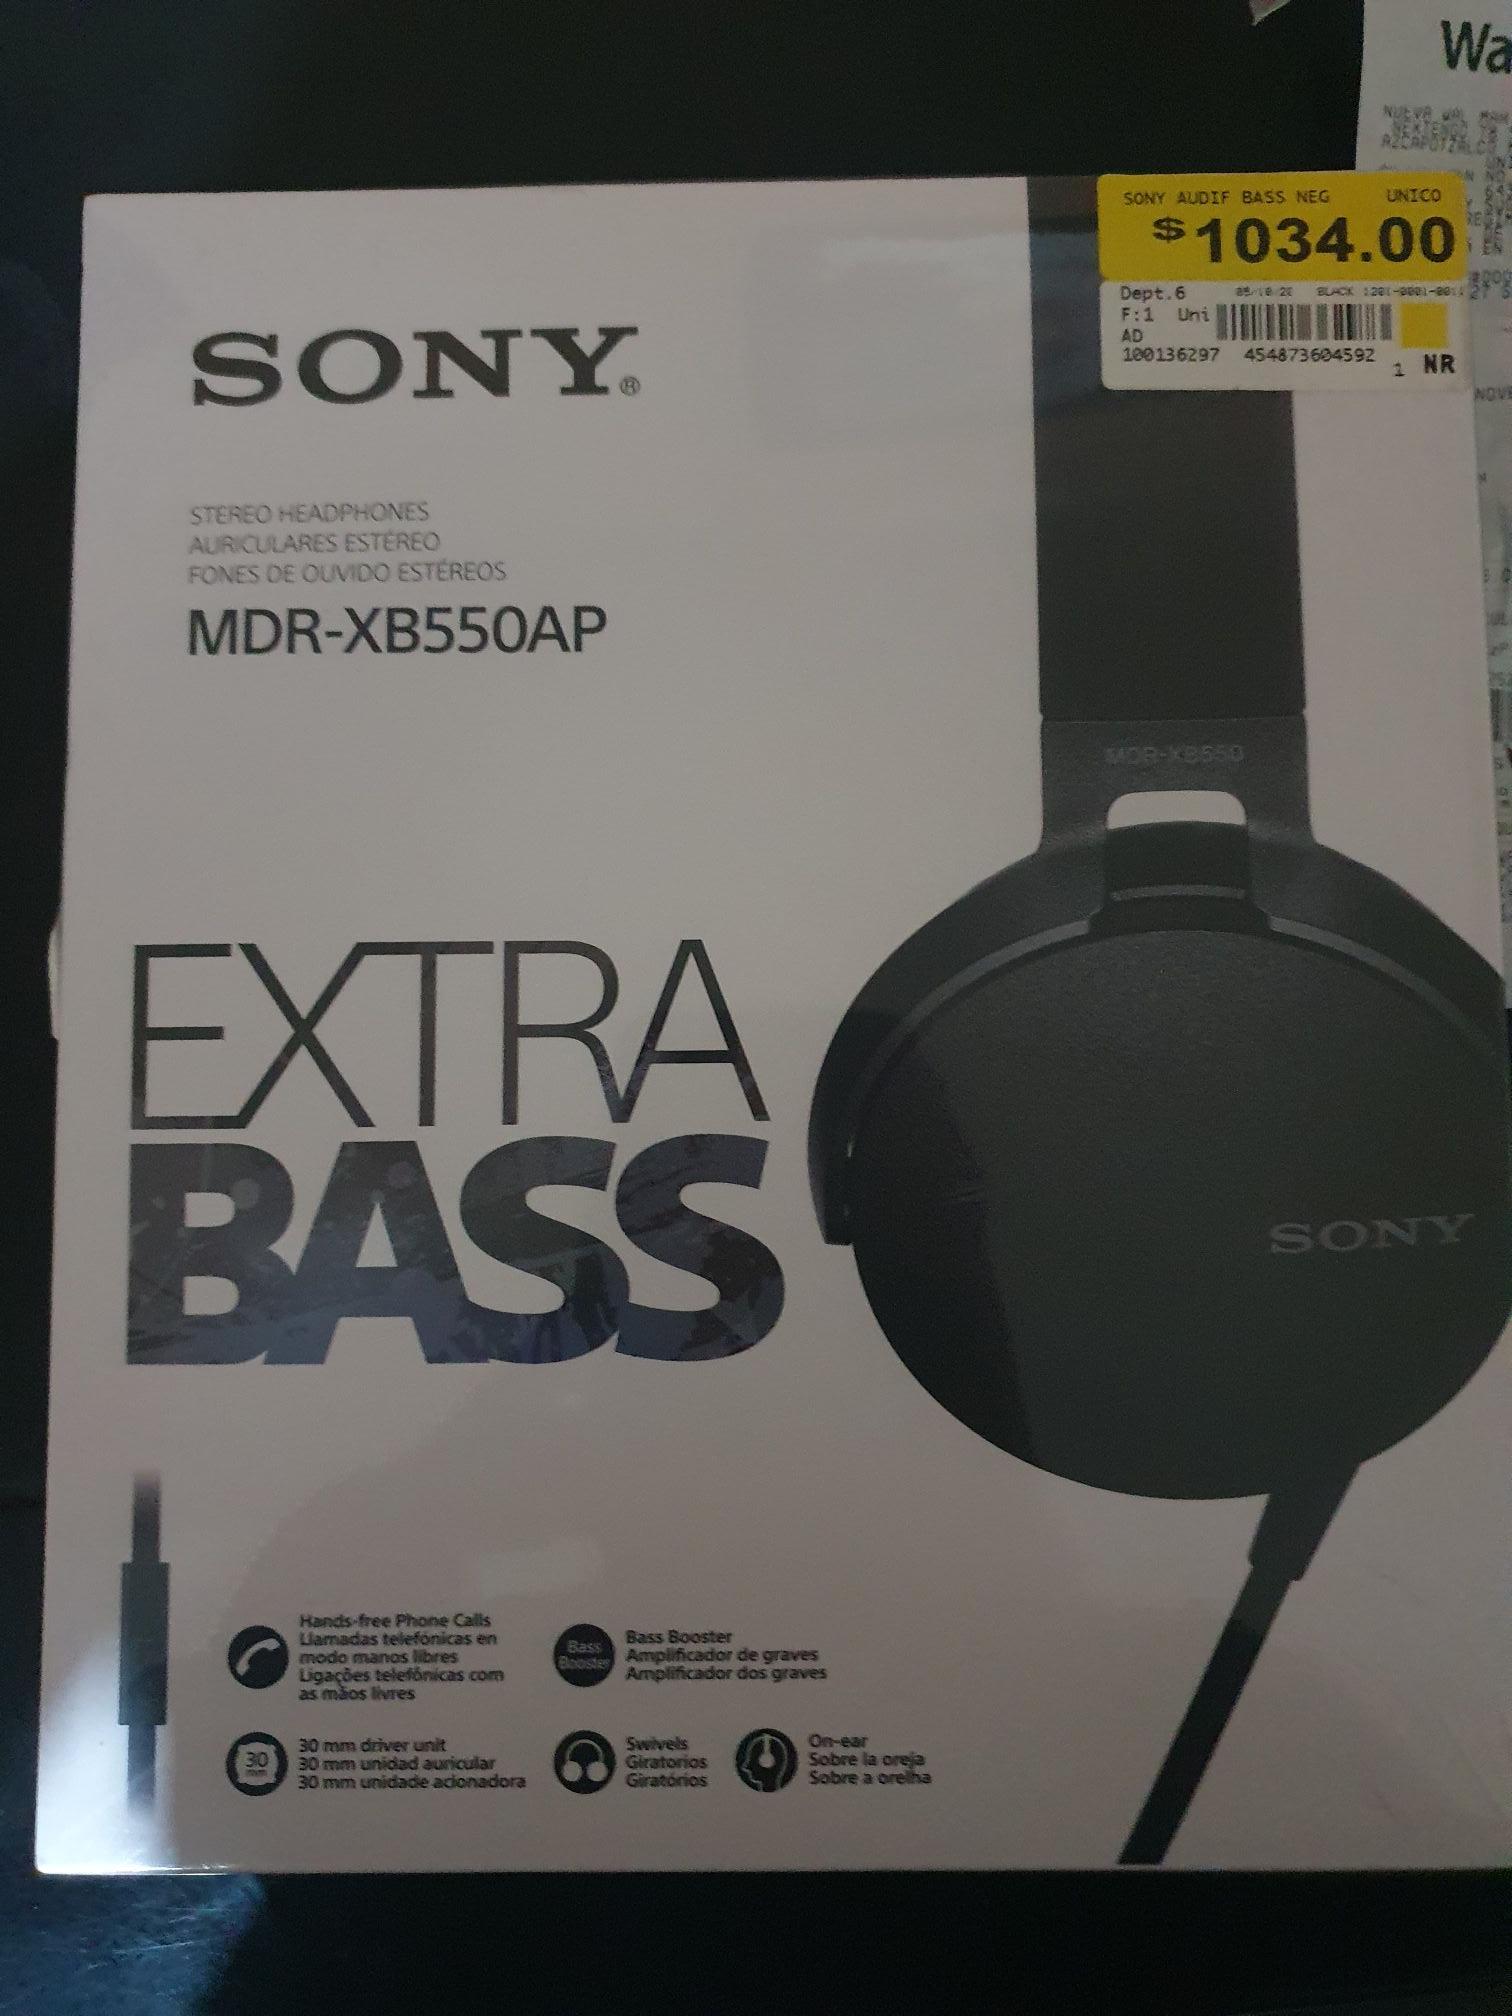 WALMART AUDIFONOS SONY EXTRA BASS MDR-XB550AP